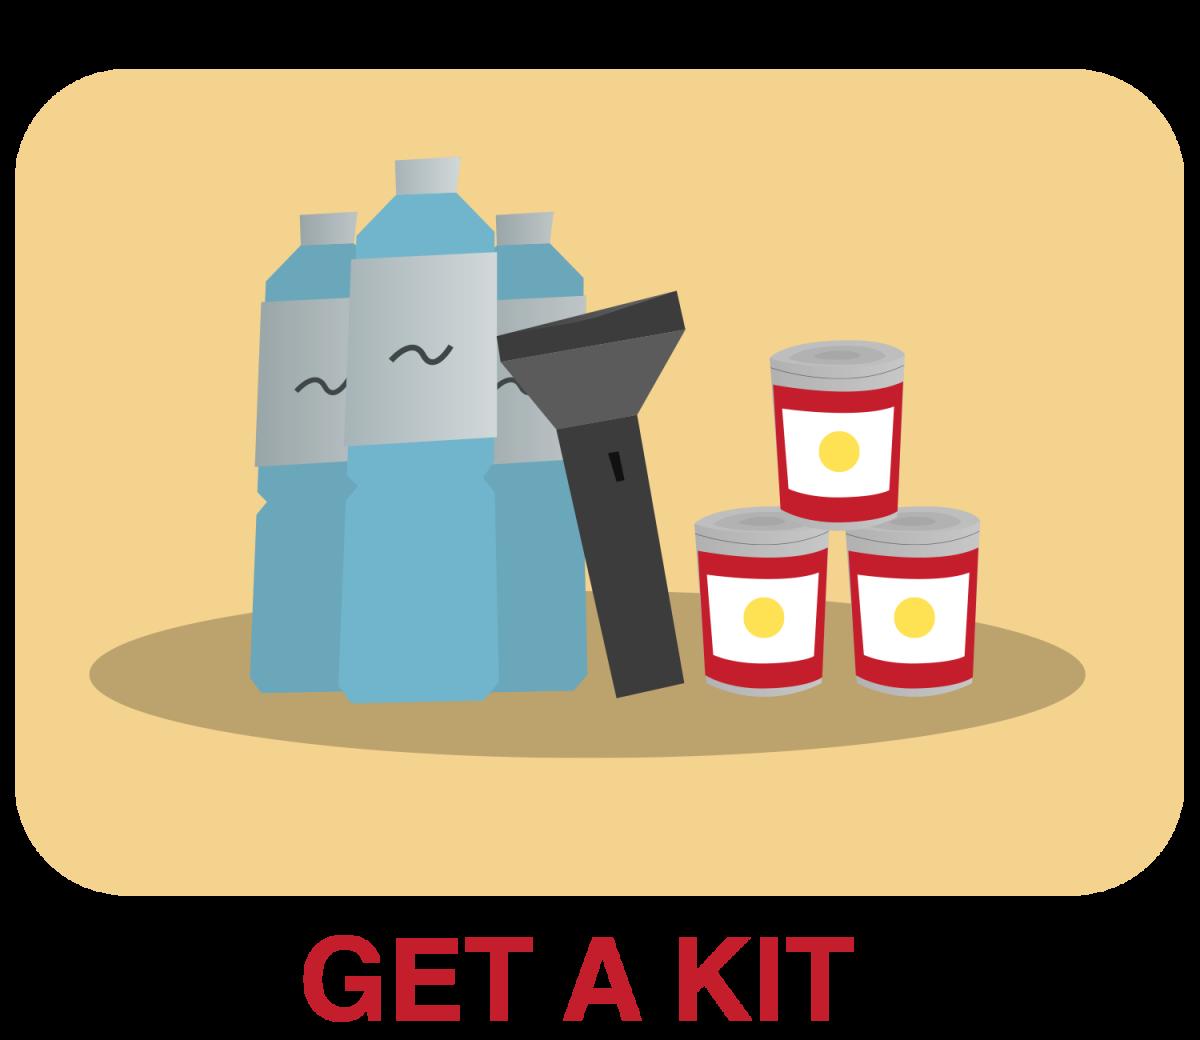 Get a Kit